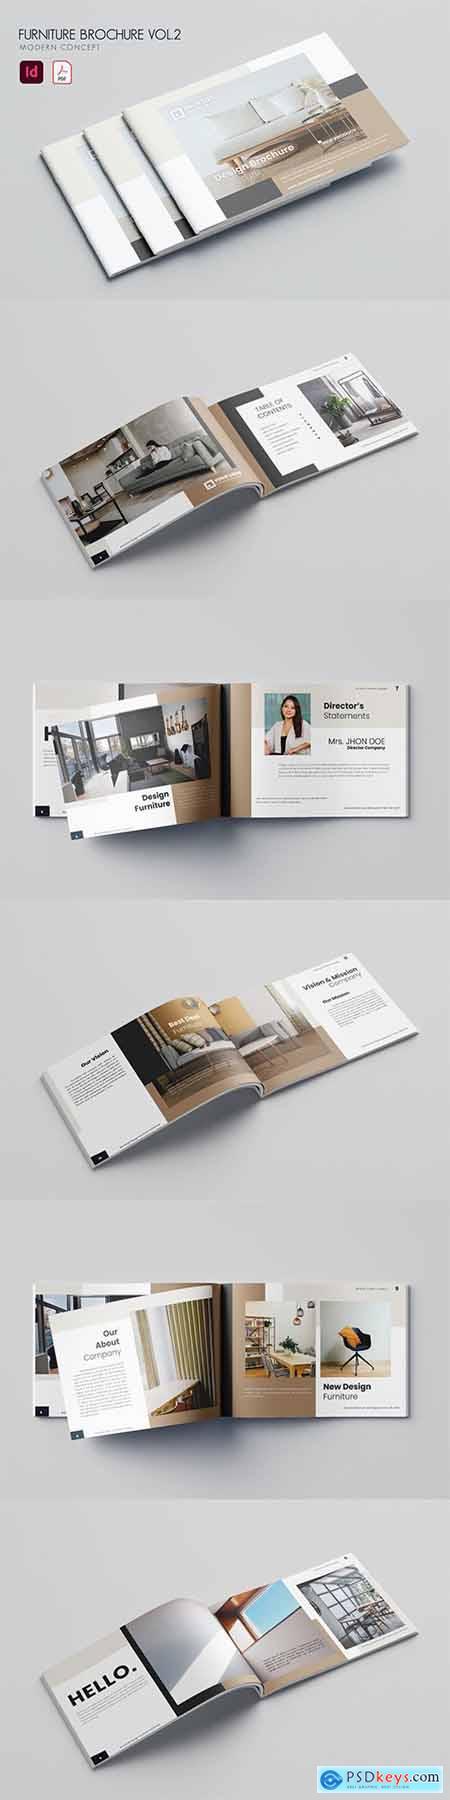 Furniture Brochure Vol.2 PCZ2MS9